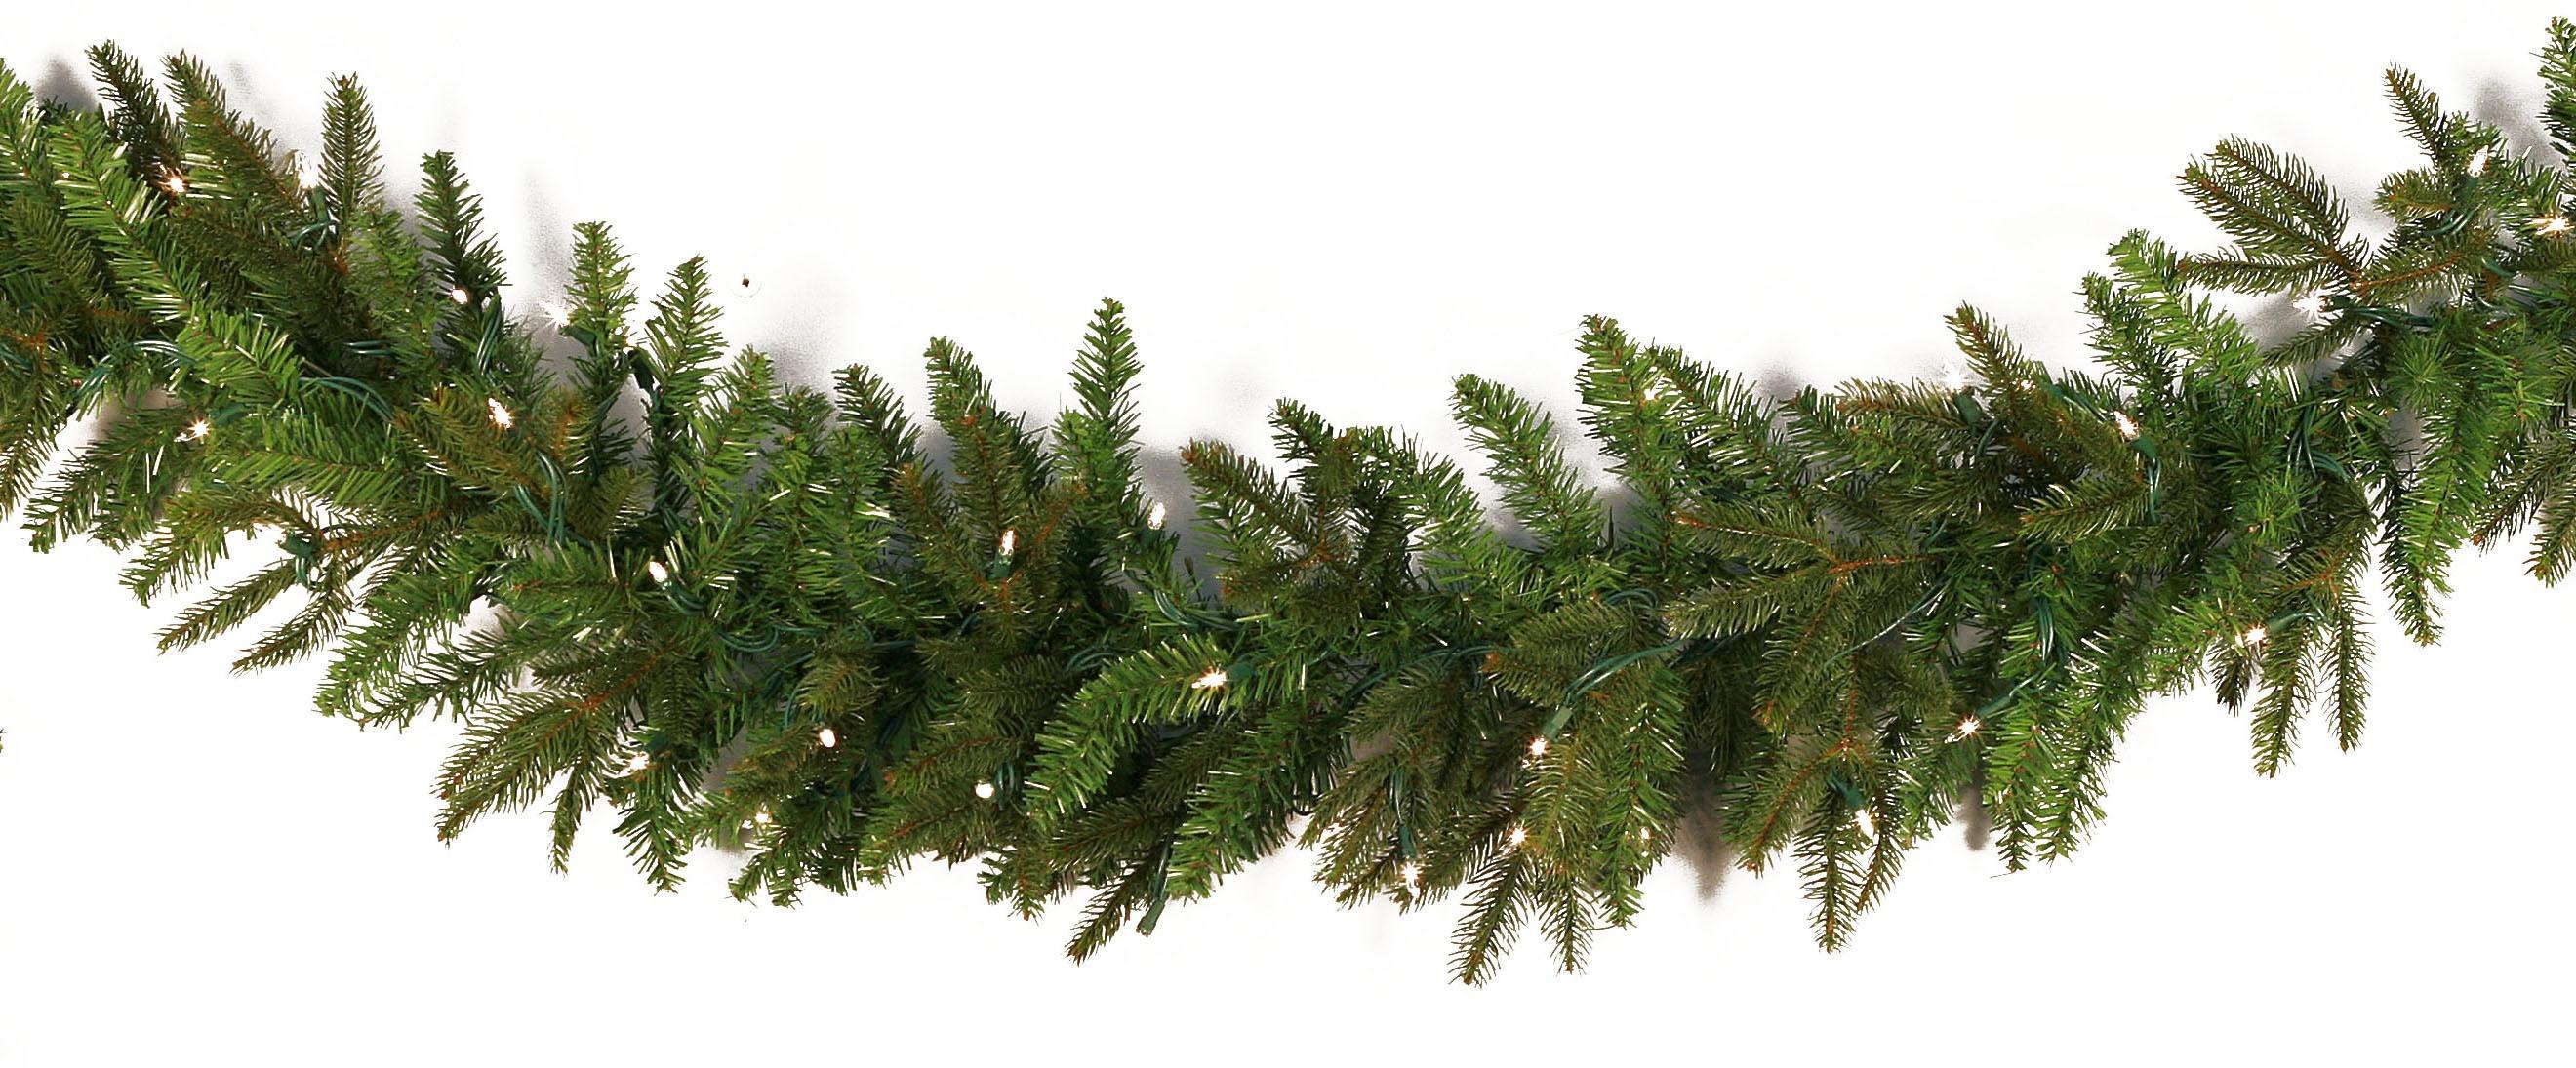 Bulk Christmas Garland.Fraser Fir Trutip Pe Pvc Unlit Christmas Garland